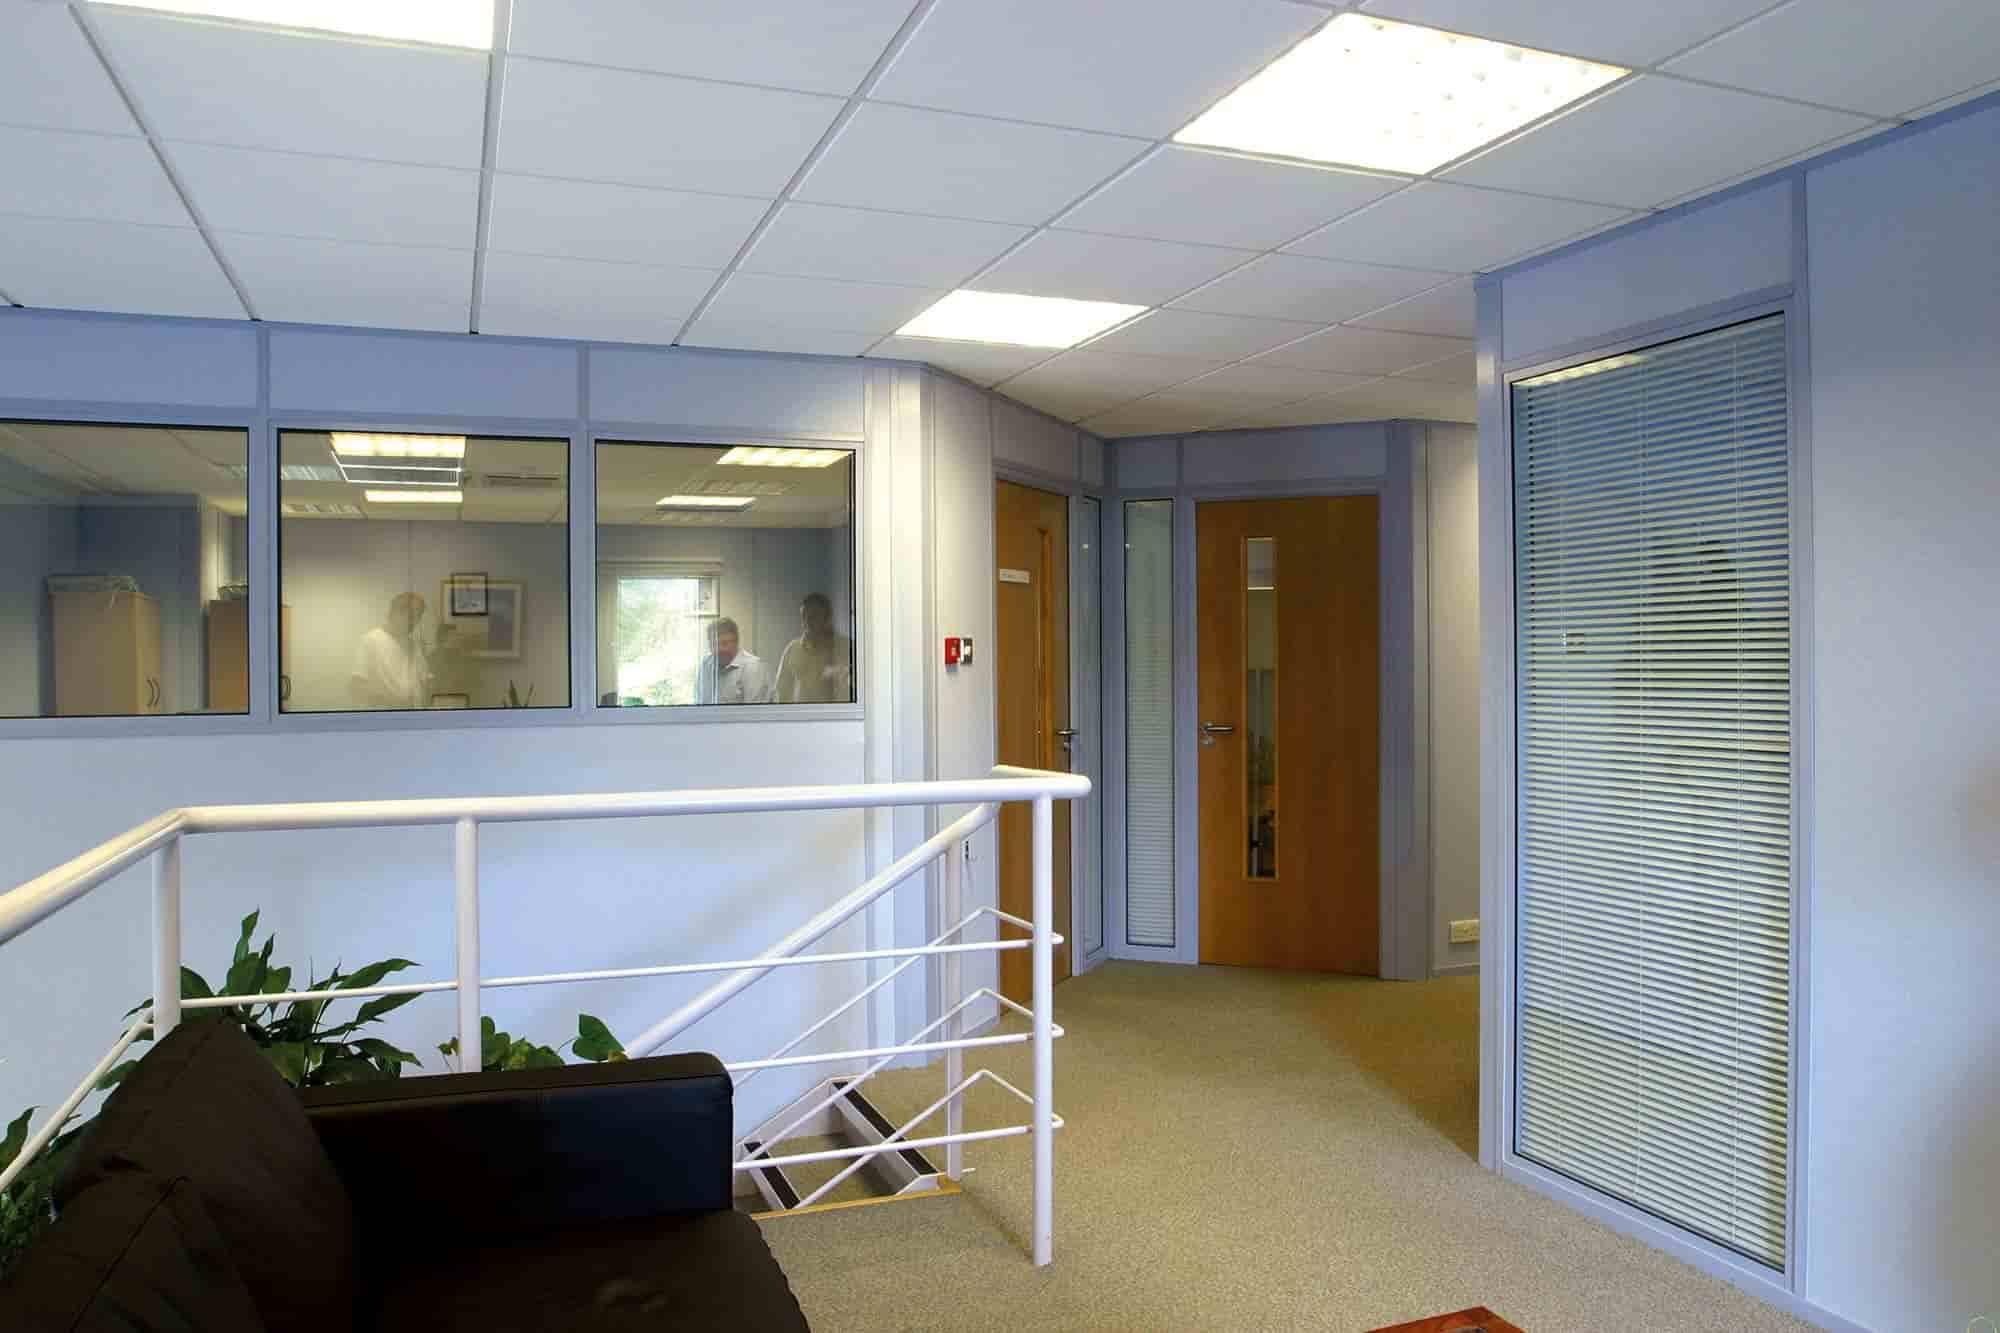 Centre glazed demountable partitioning